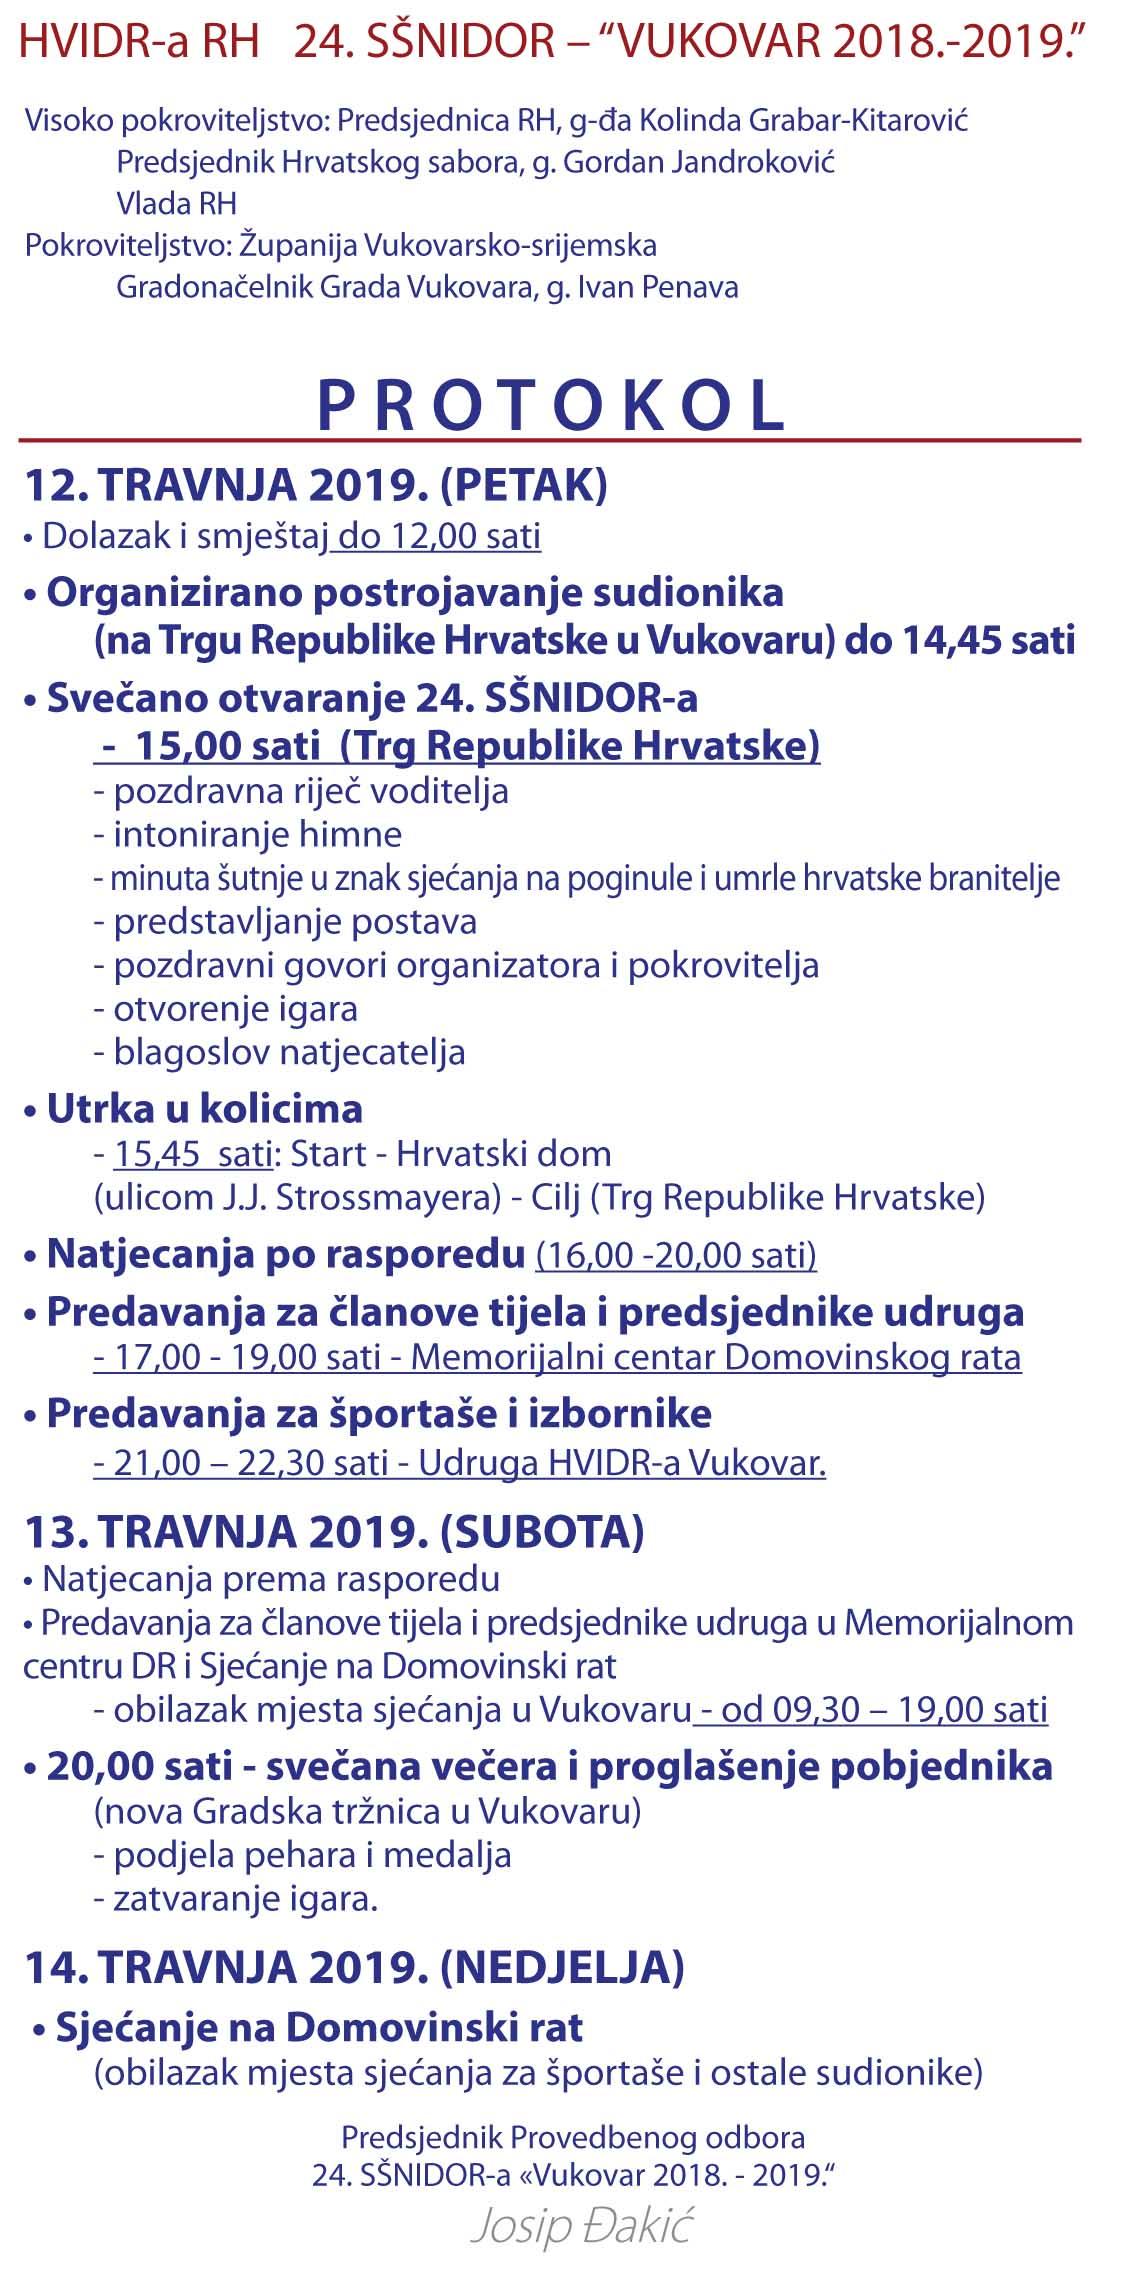 24 SŠNIDOR Vukovar 2018-2019